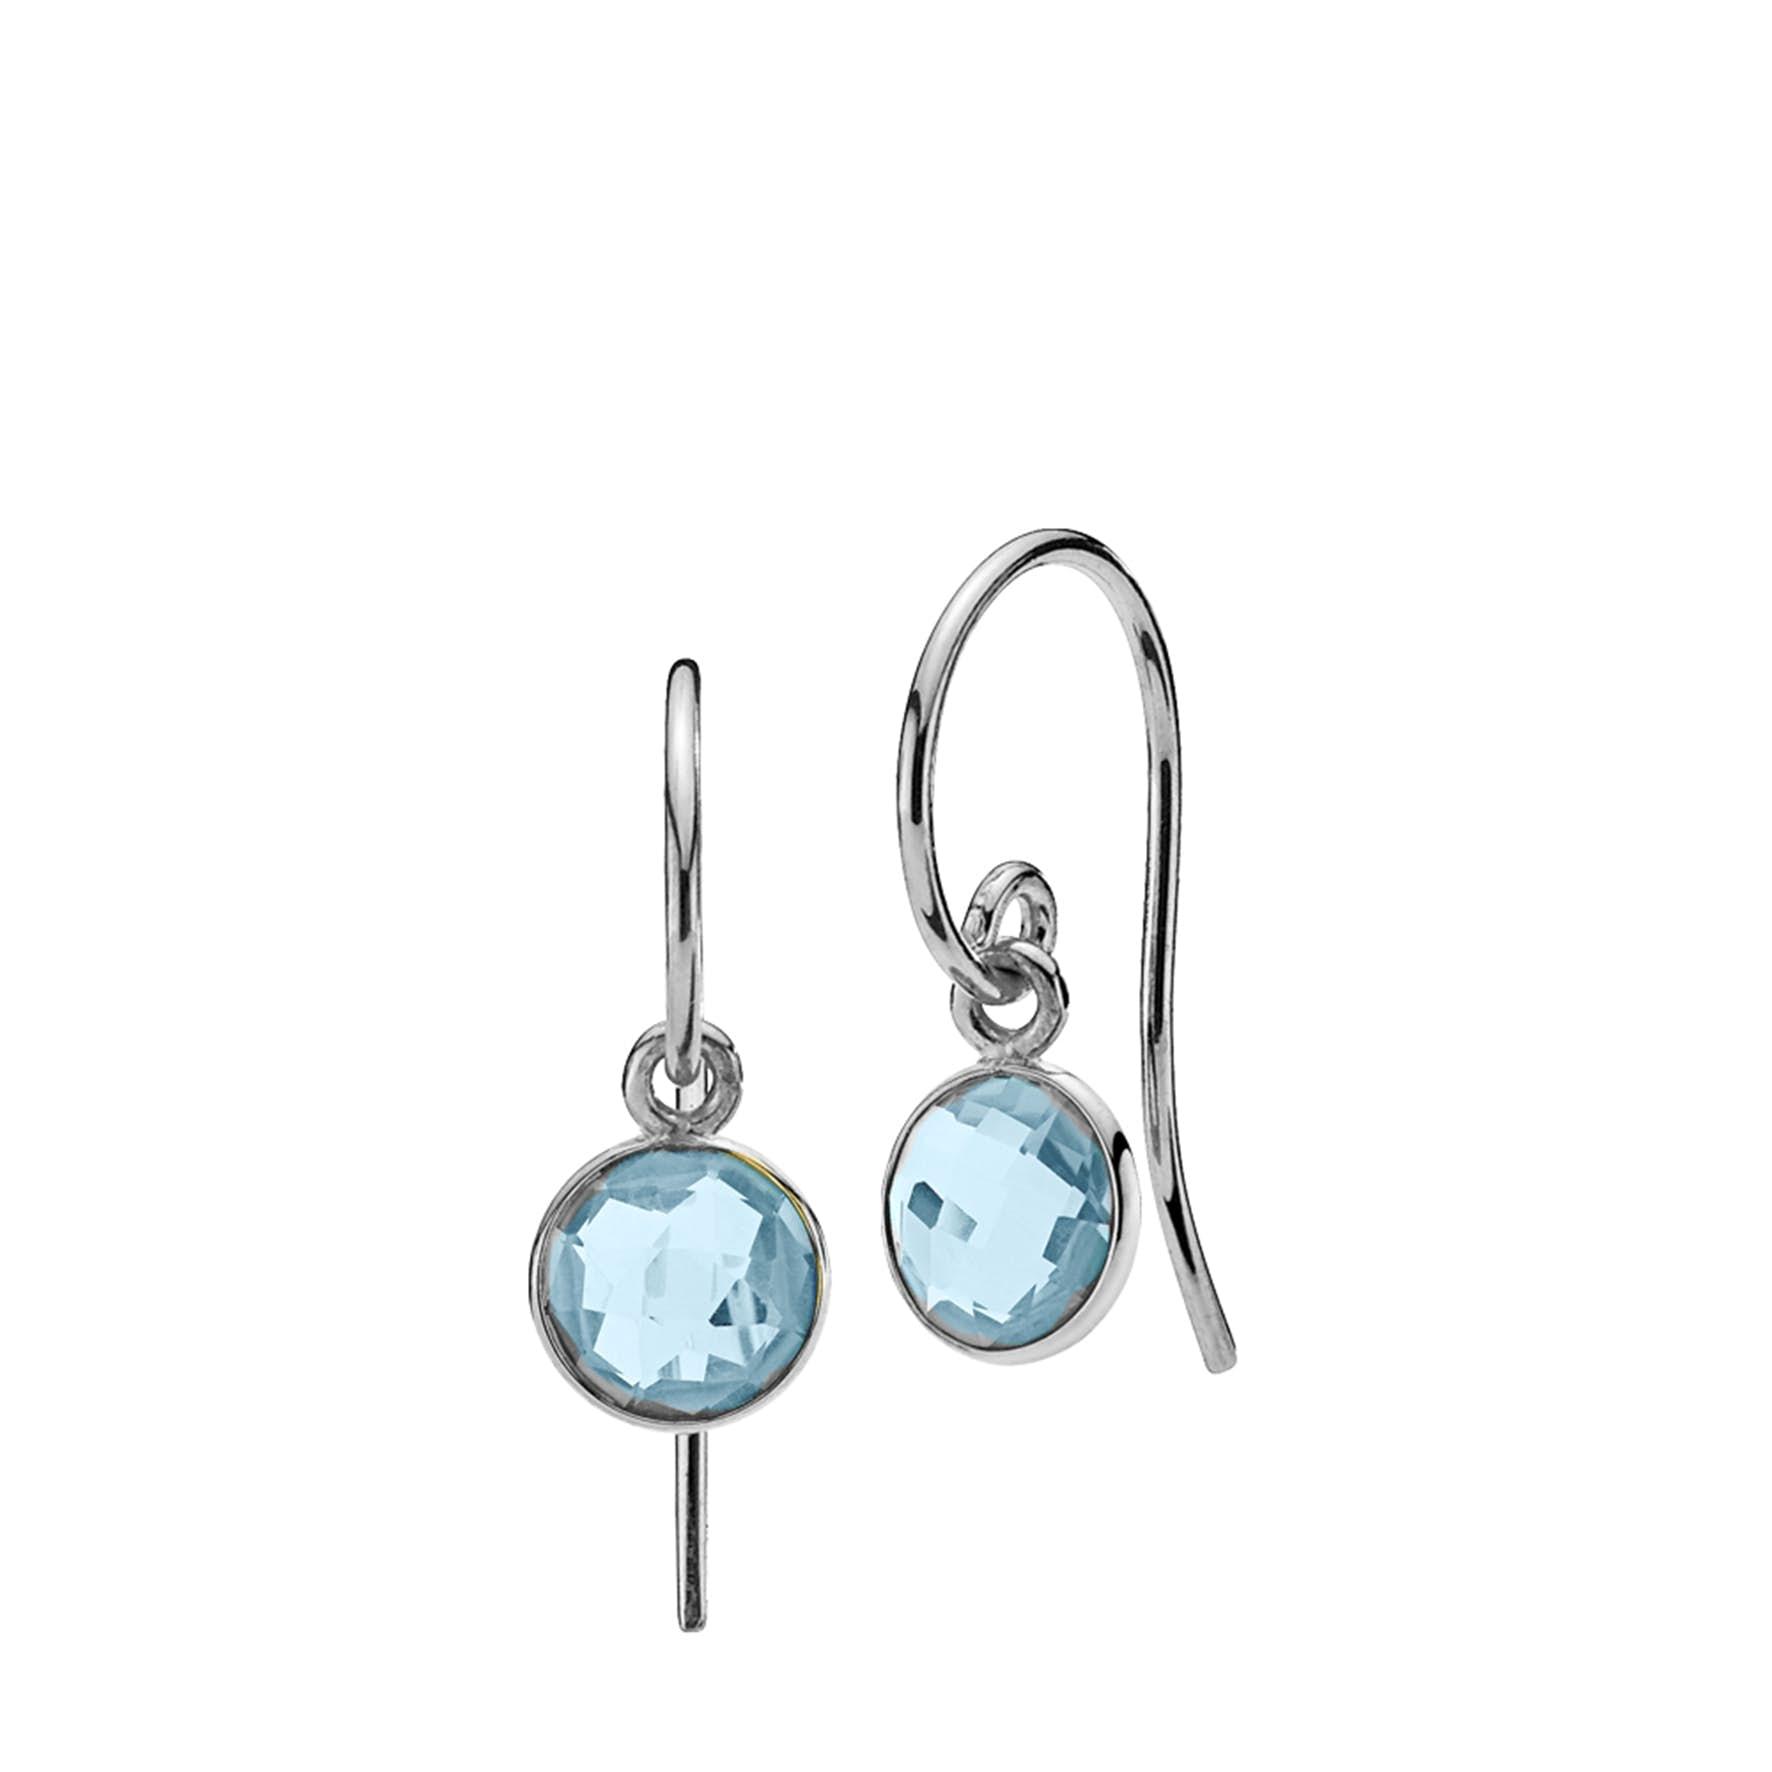 Prima Donna Earrings Small Aqua Blue von Izabel Camille in Silber Sterling 925|Aqua Blue